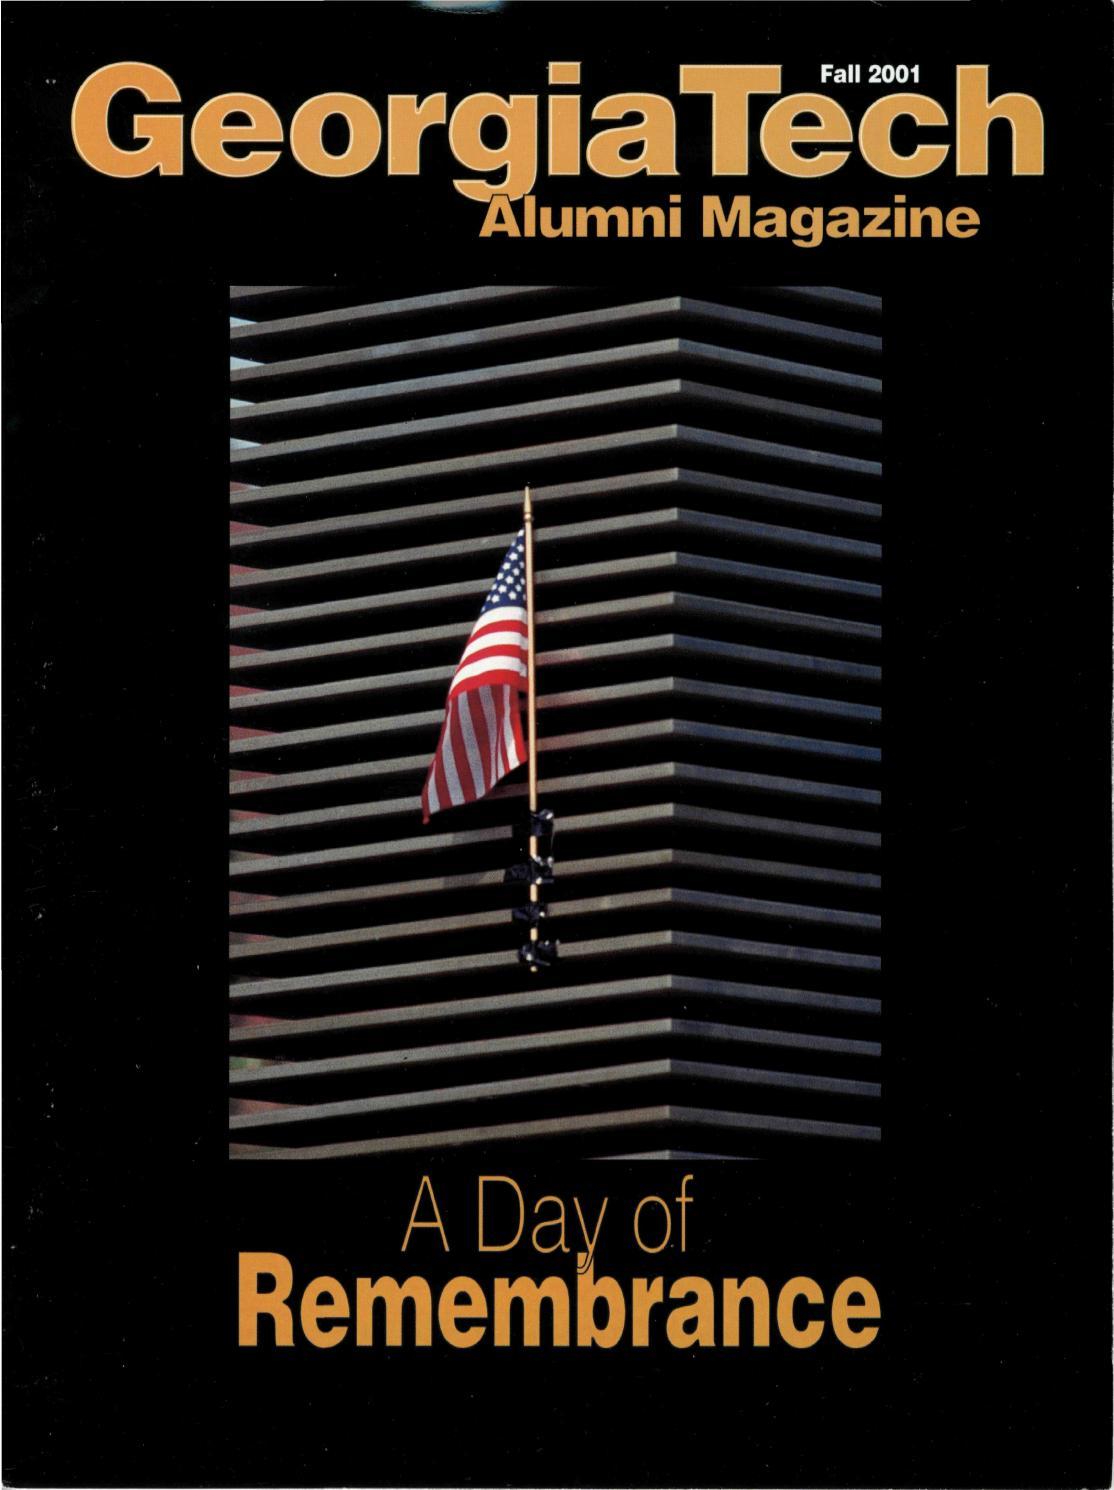 Georgia Tech Alumni Magazine Vol. 78, No. 02 2001 by Georgia Tech ...